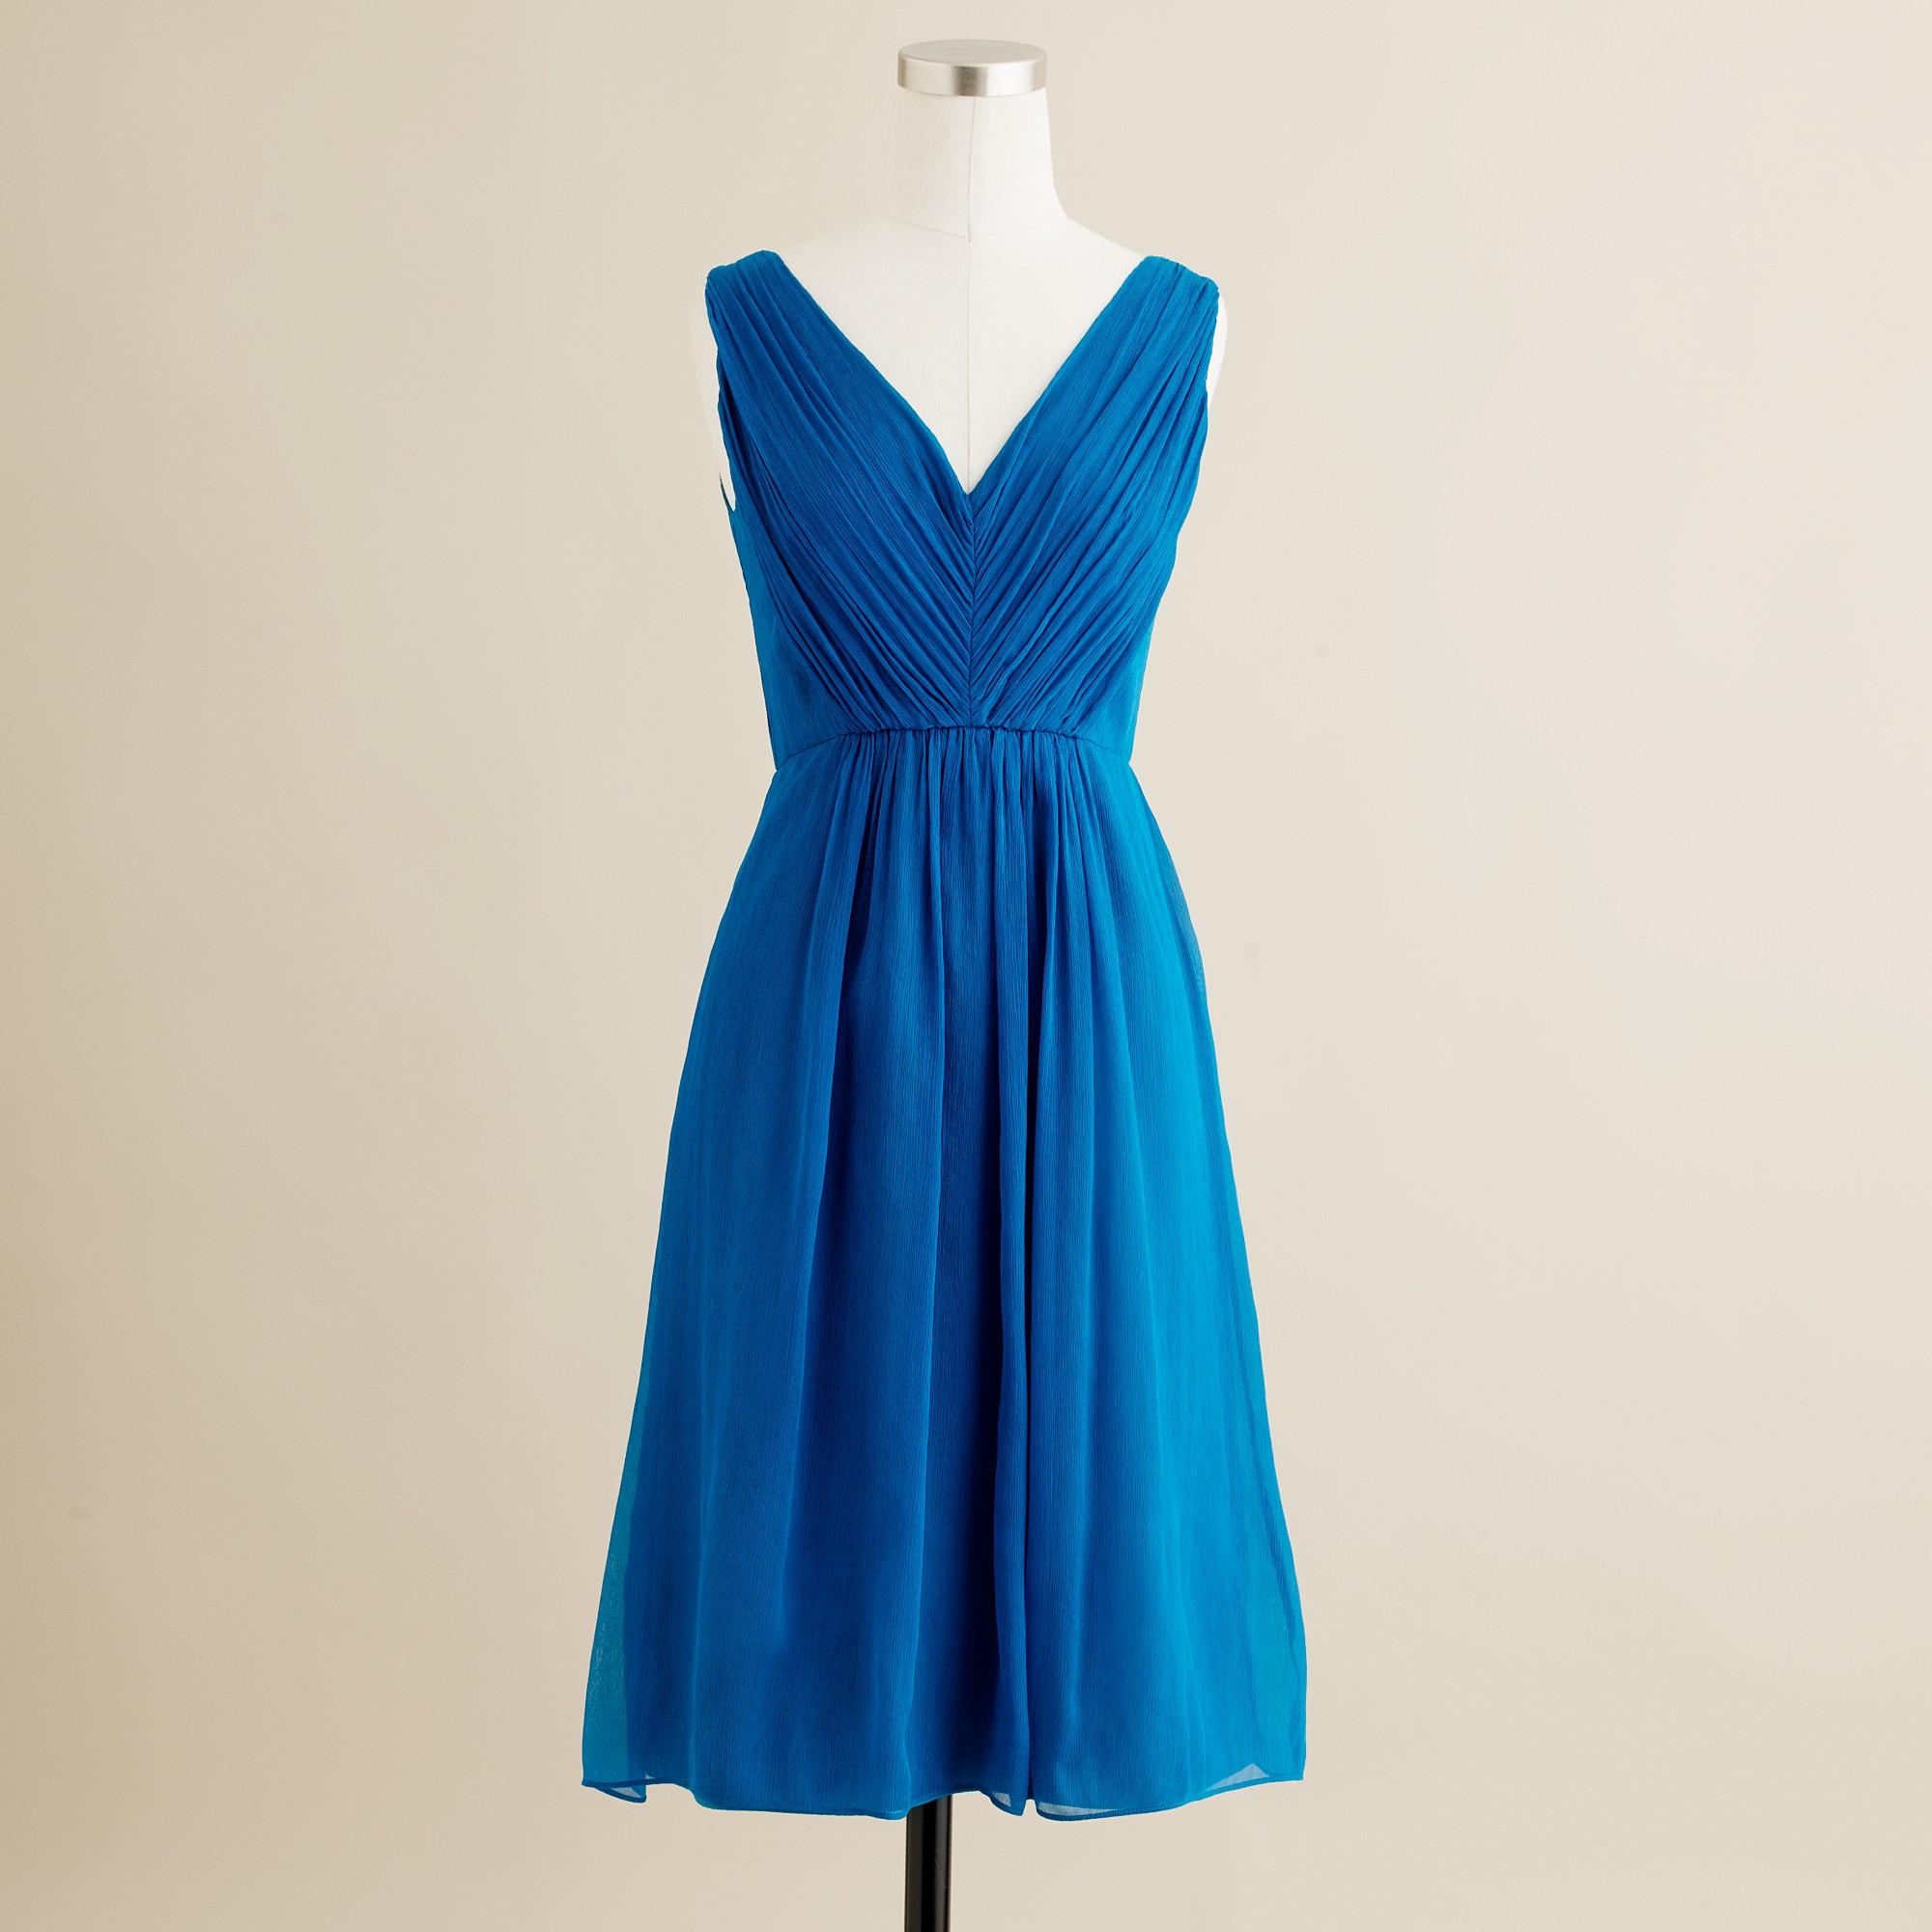 Louisa dress in silk chiffon in blue matisse blue for J crew short wedding dresses